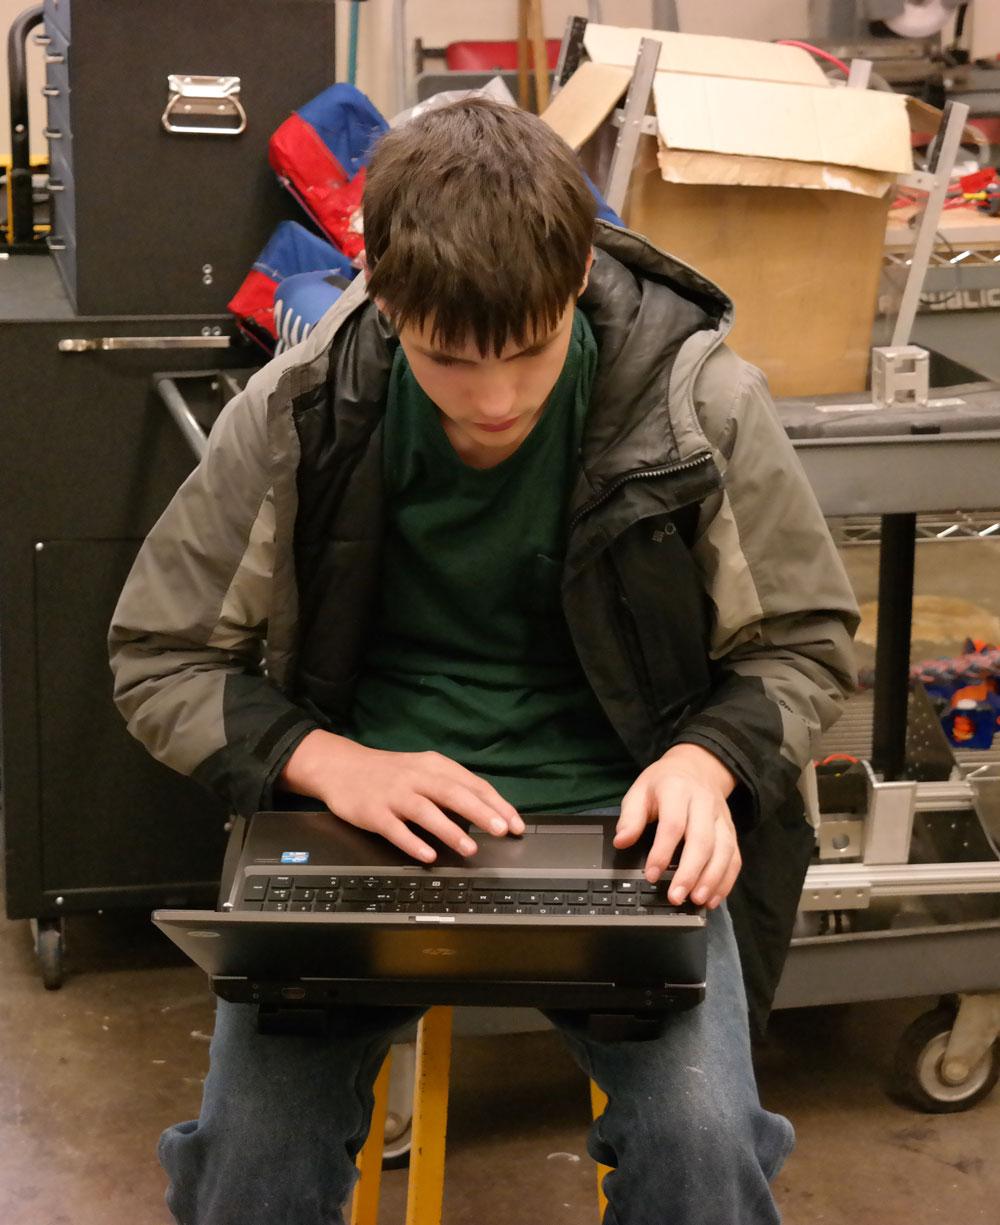 James working hard